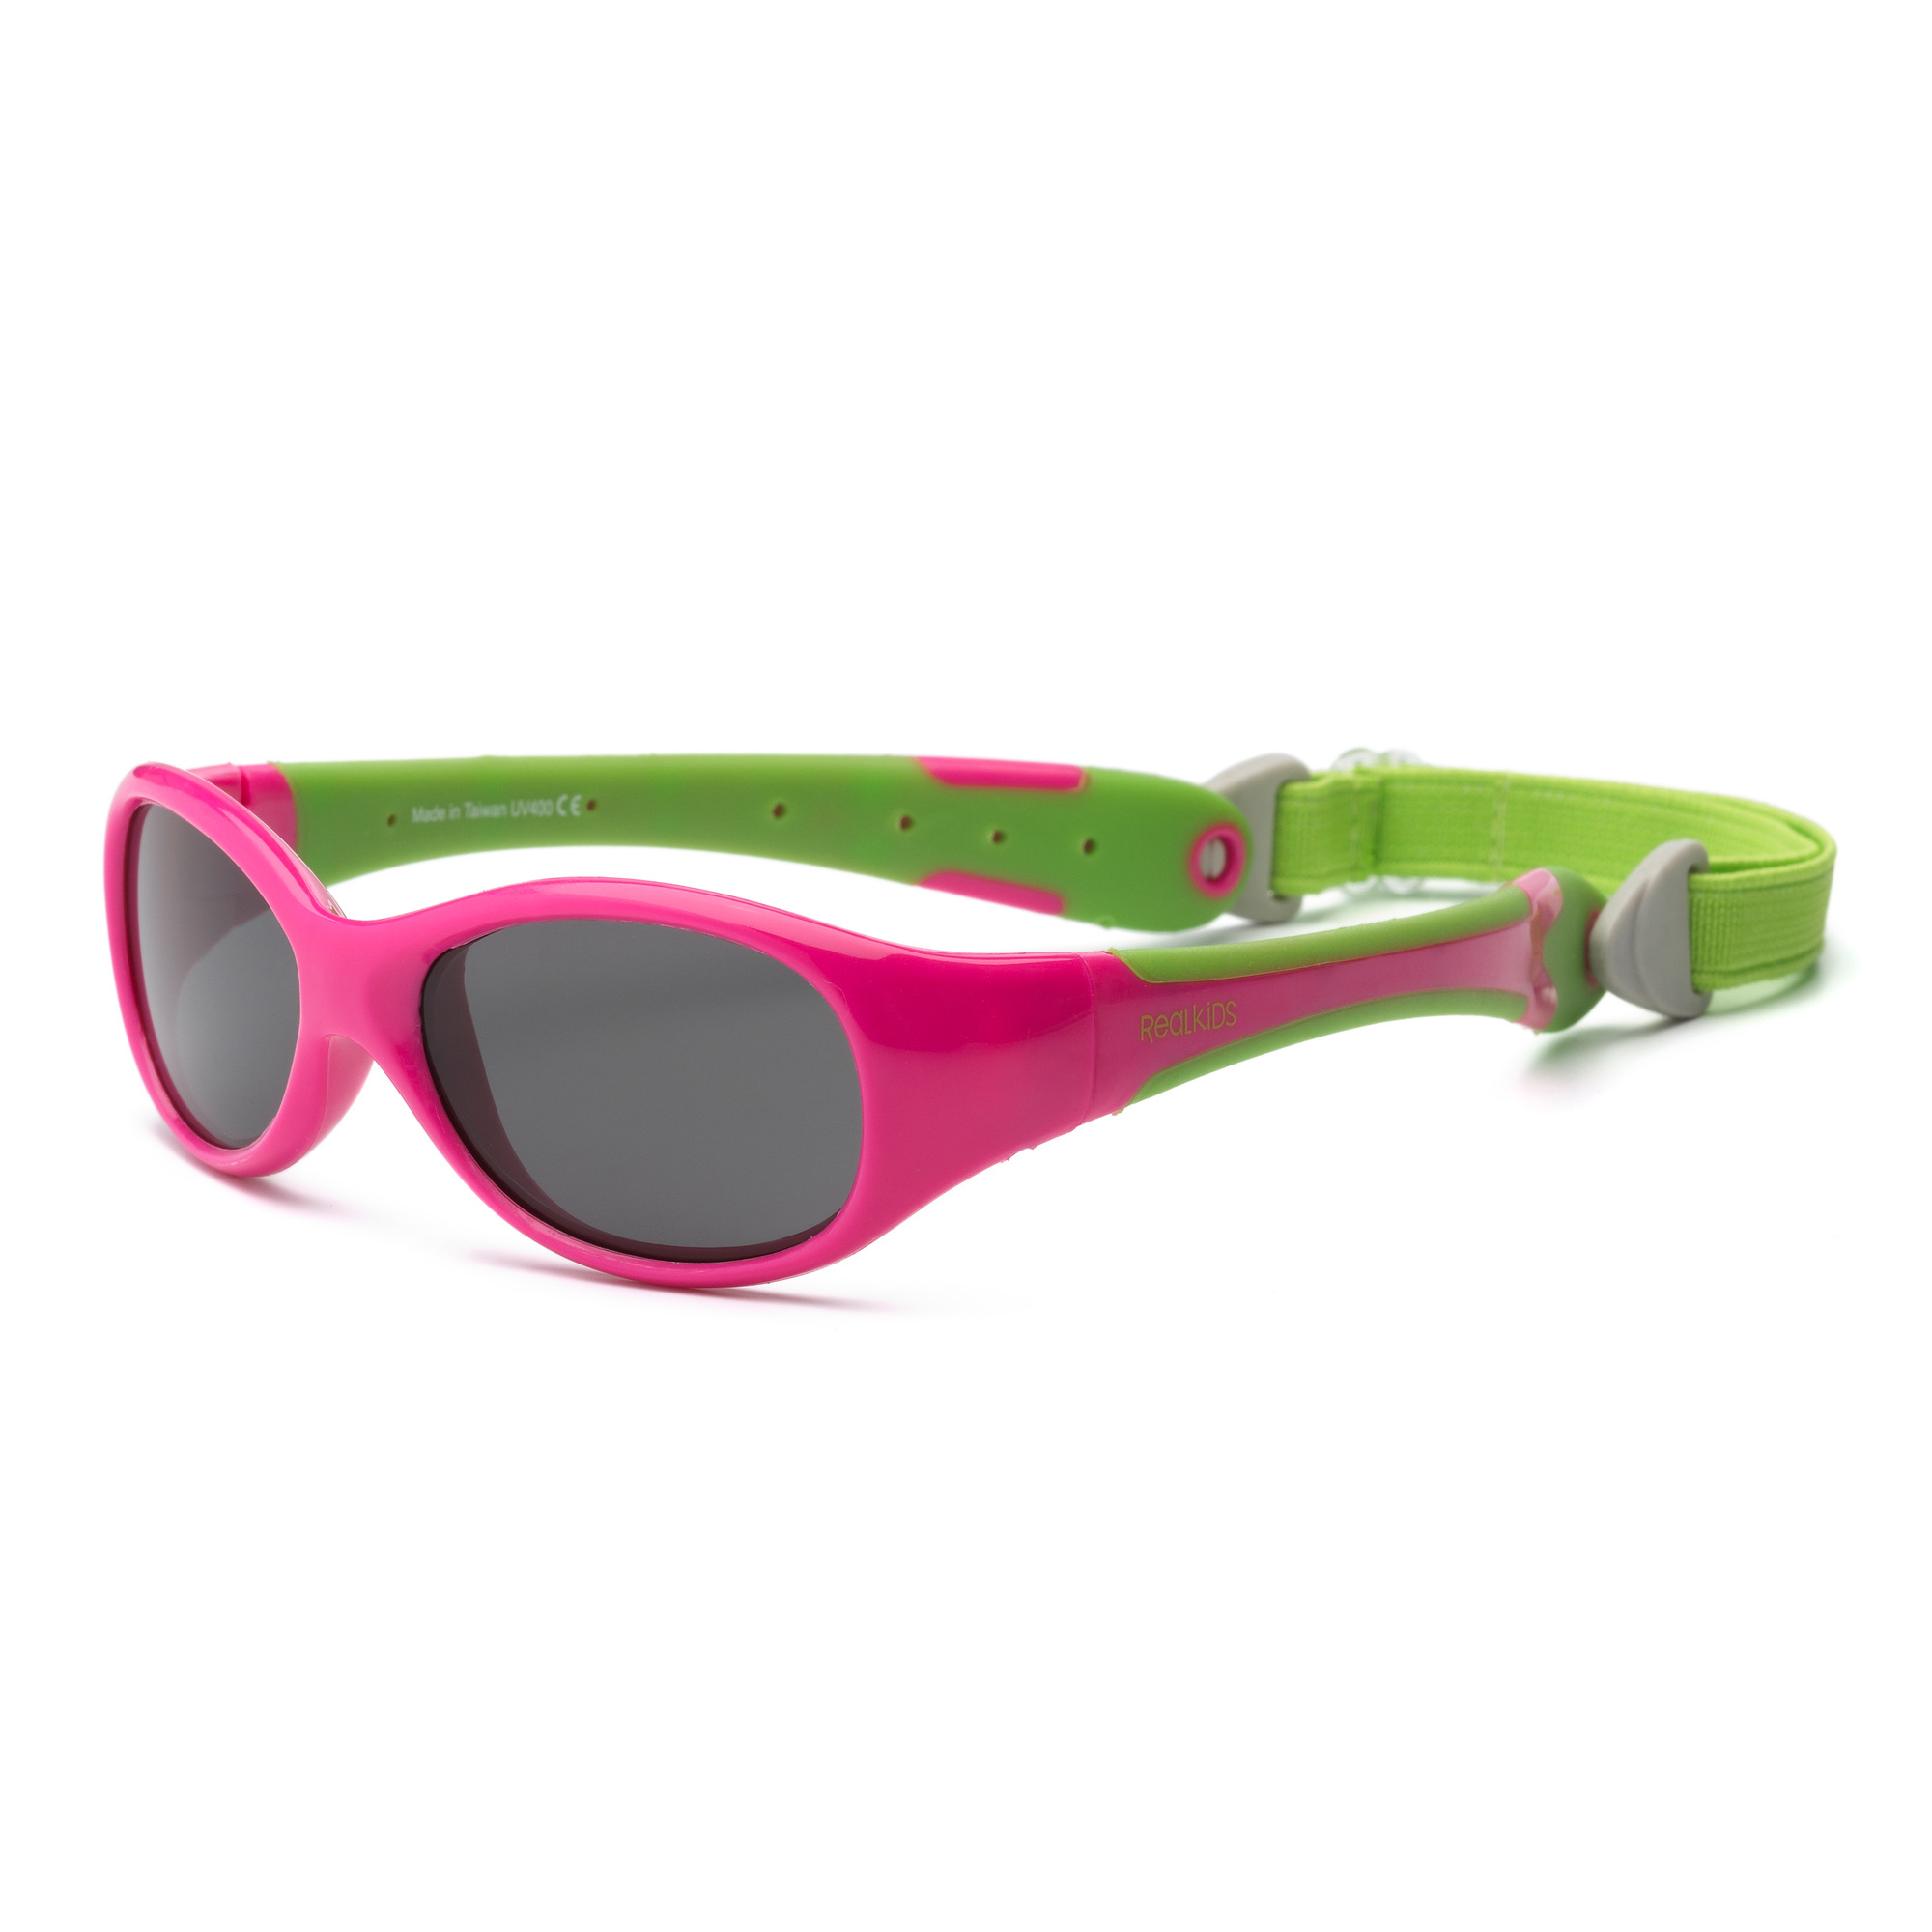 92d070b18334 Explorer Sunglasses for Babies   Unbreakable Sunglasses   Real Kid ...